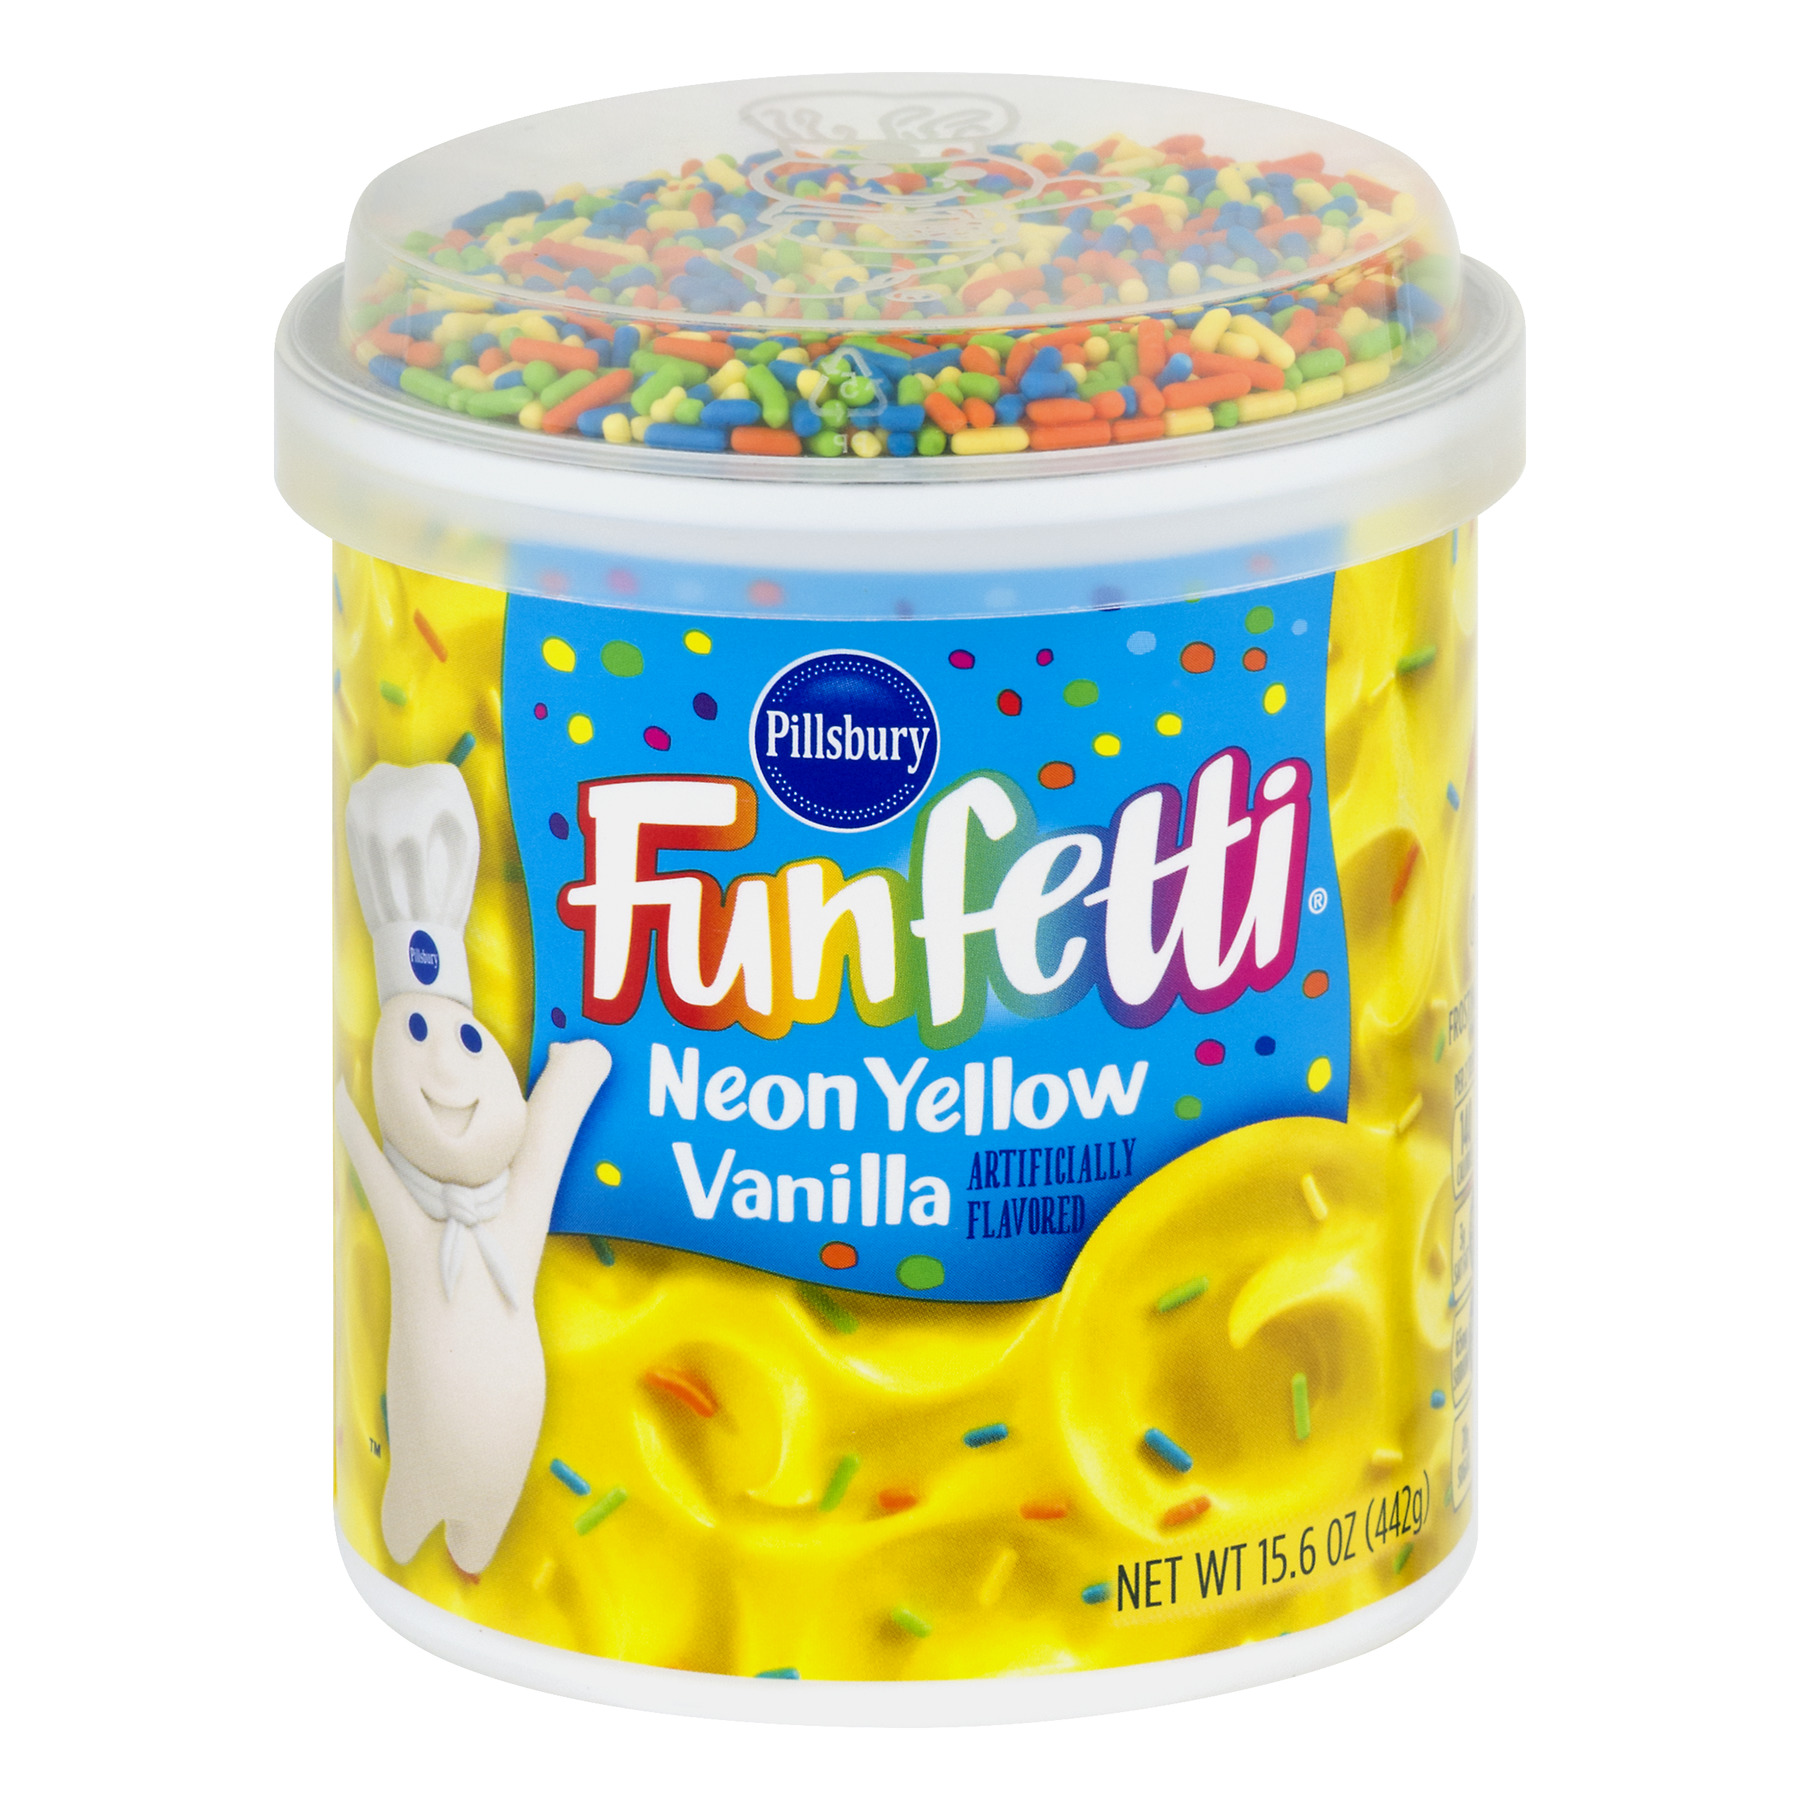 Pillsbury Funfetti Neon Yellow Vanilla Frosting, 15.6 oz